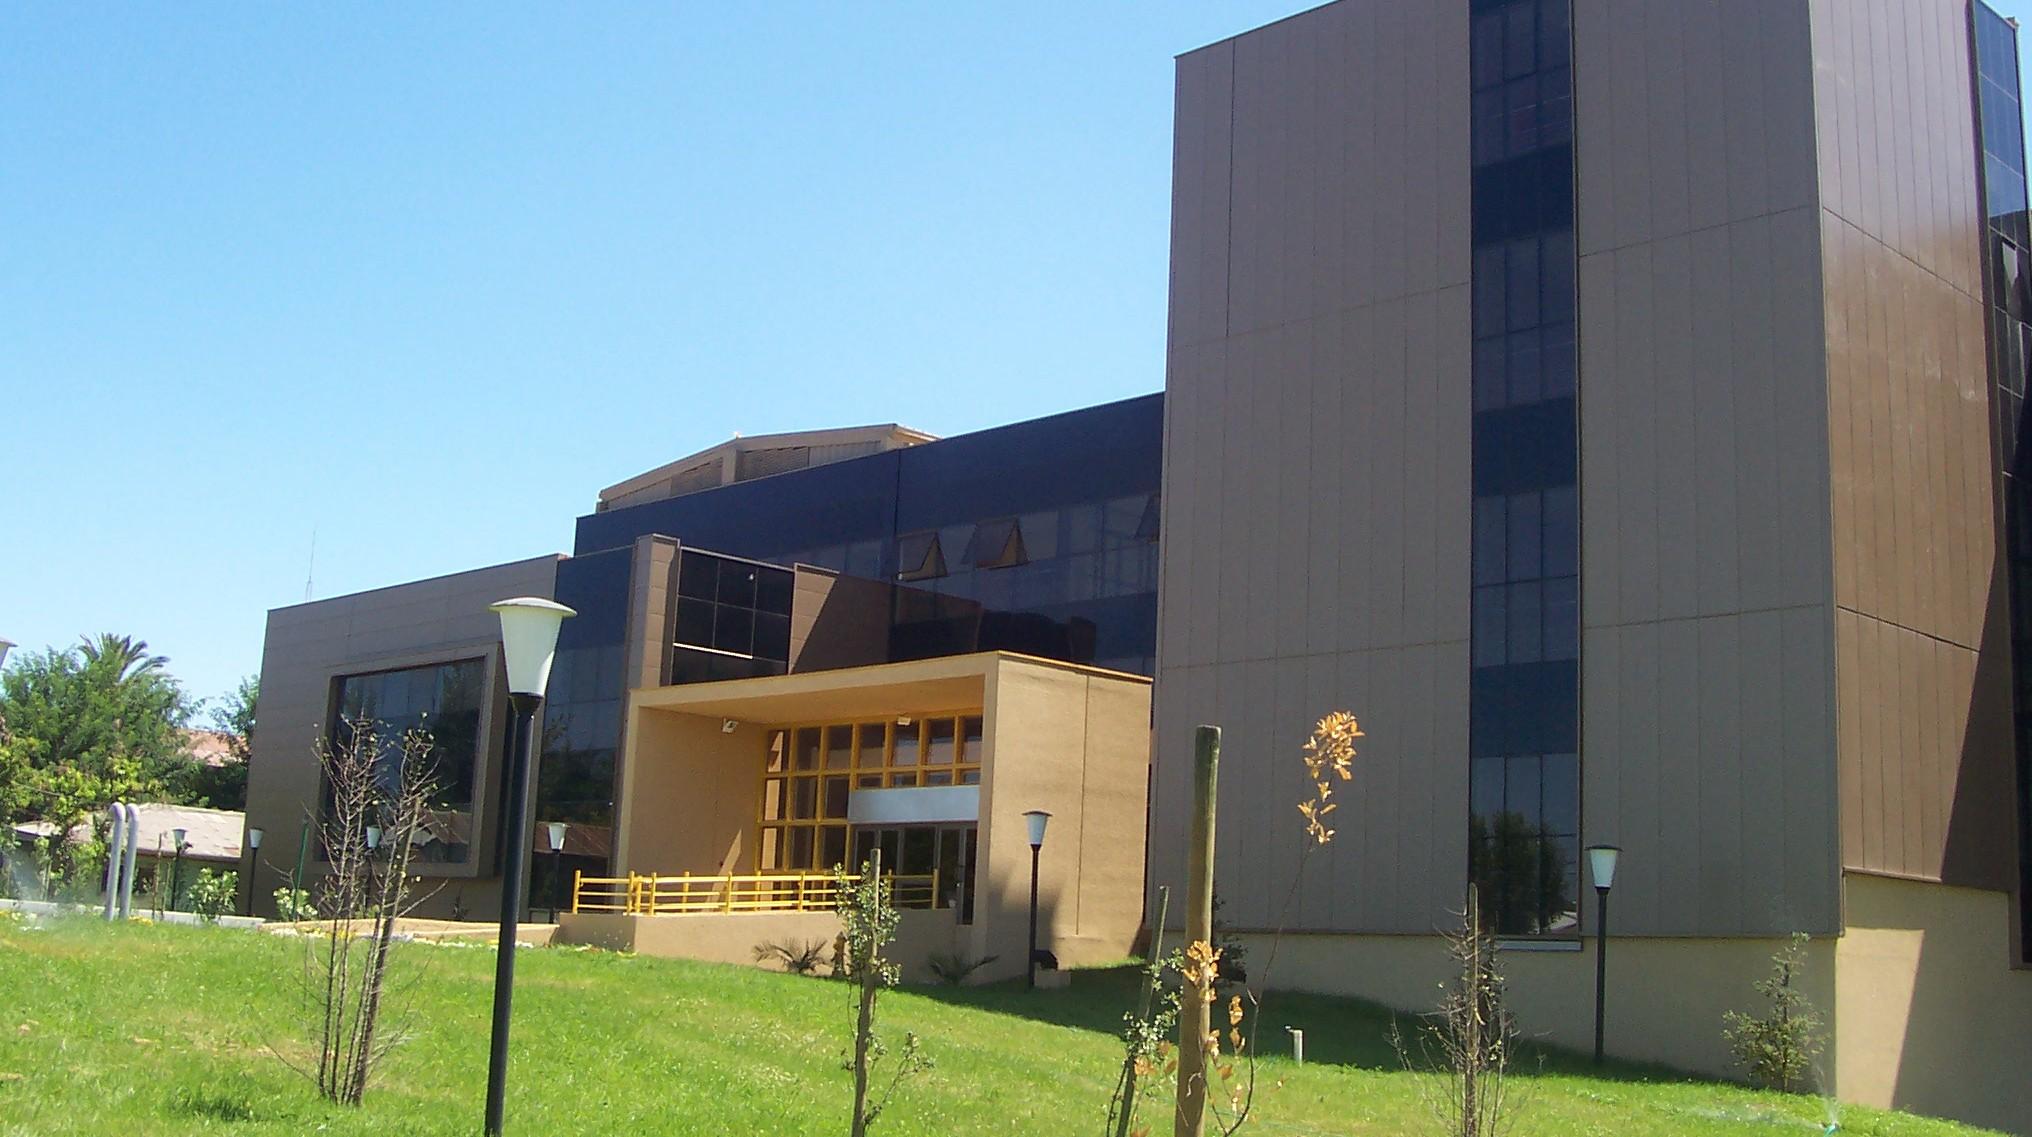 www.hospitaldetalca.cl